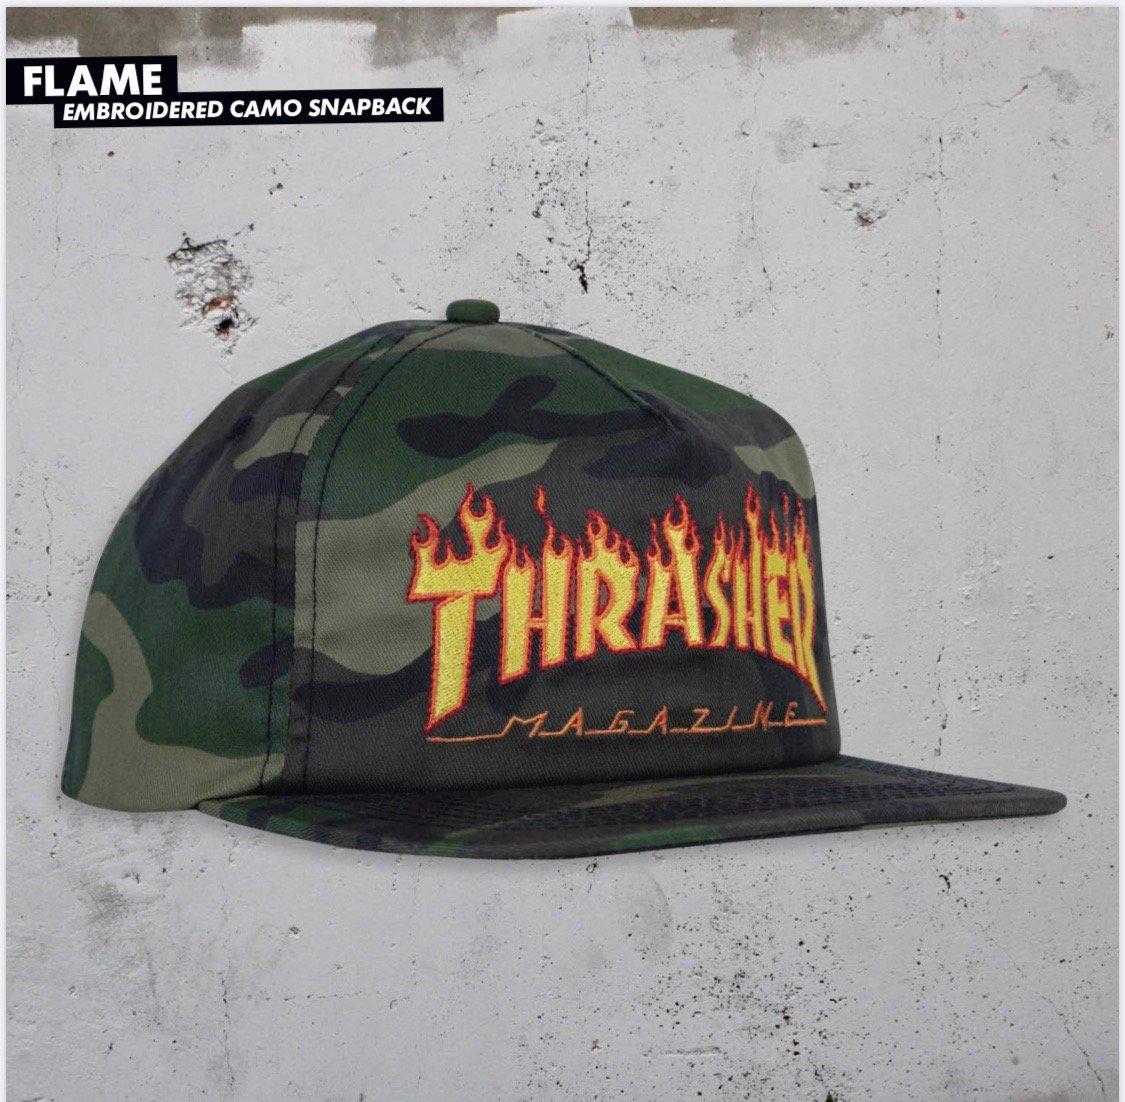 Thrasher Flame Snapback hat Camo